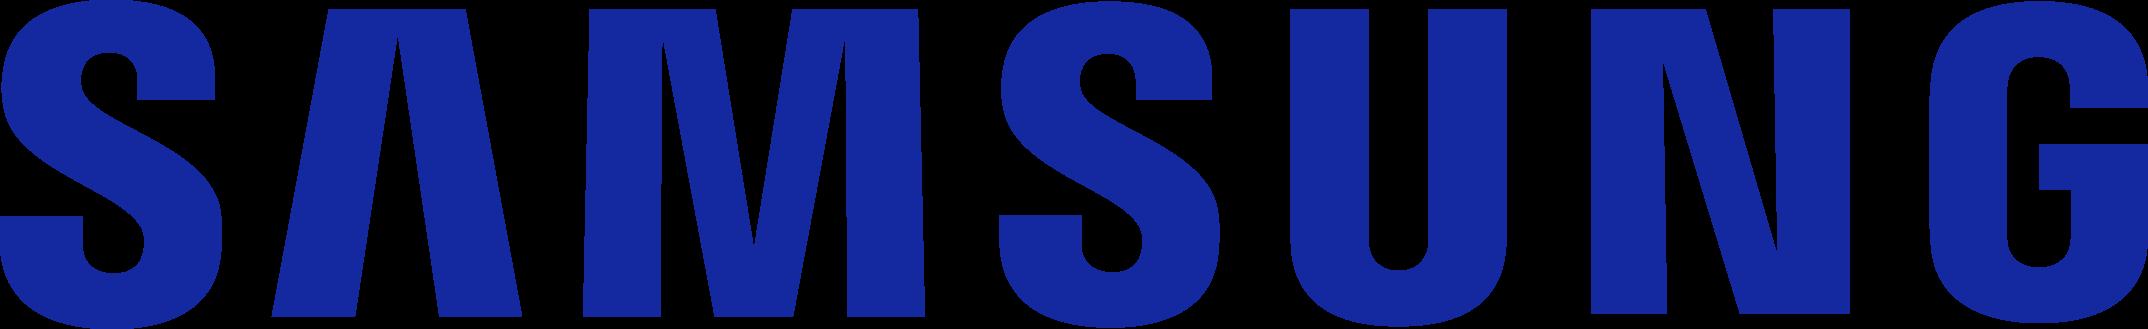 FWD50 Sponsor - Samsung